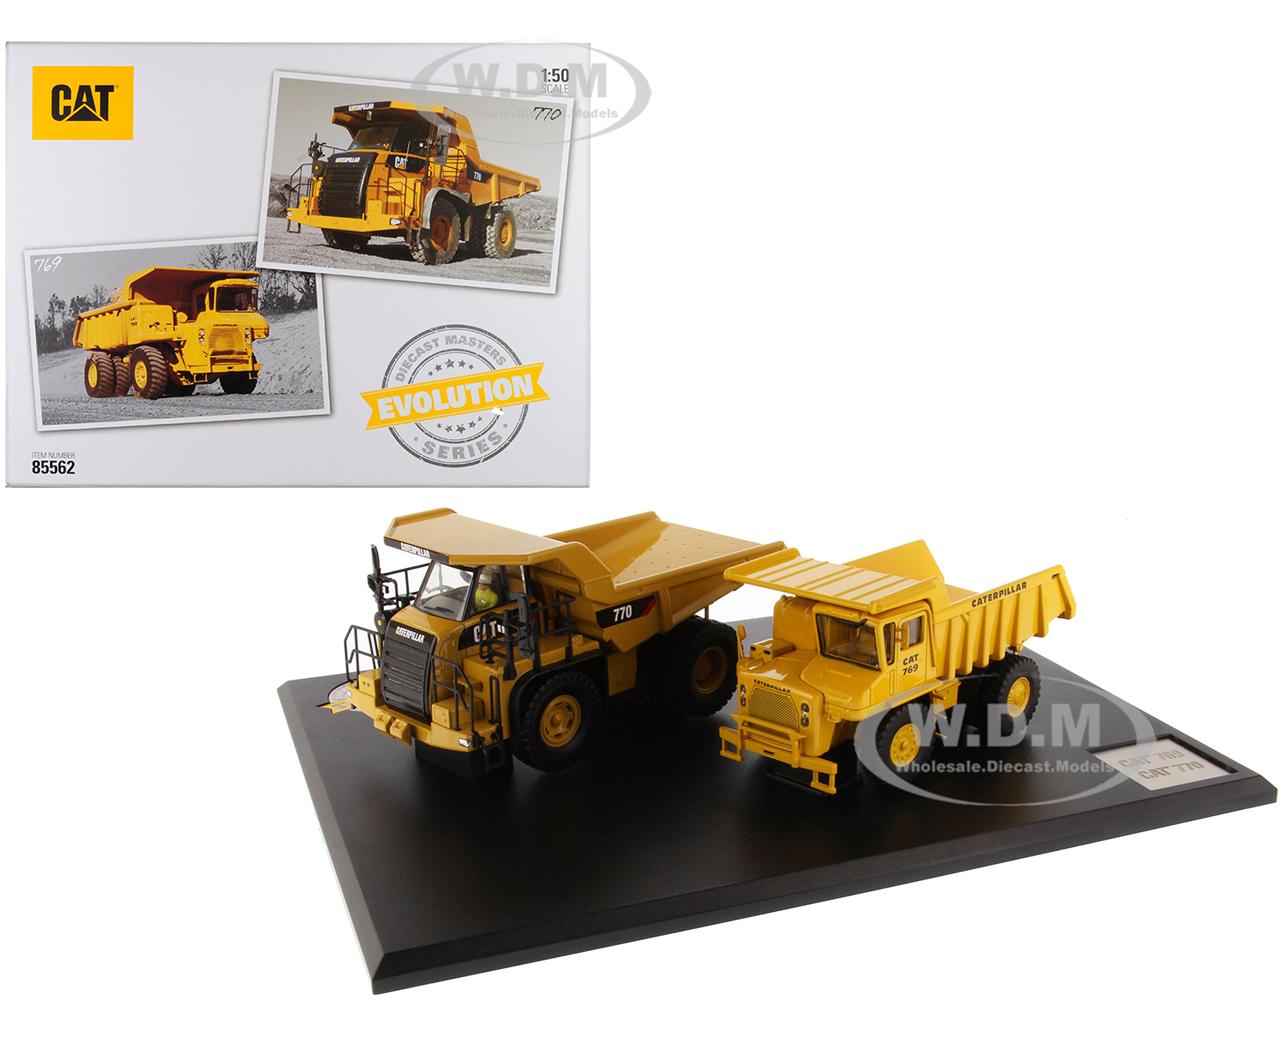 CAT Caterpillar 769 Off-Highway Truck (1963-2006) and CAT Caterpillar 770 Off-Highway Truck (2007-Present) with Operators